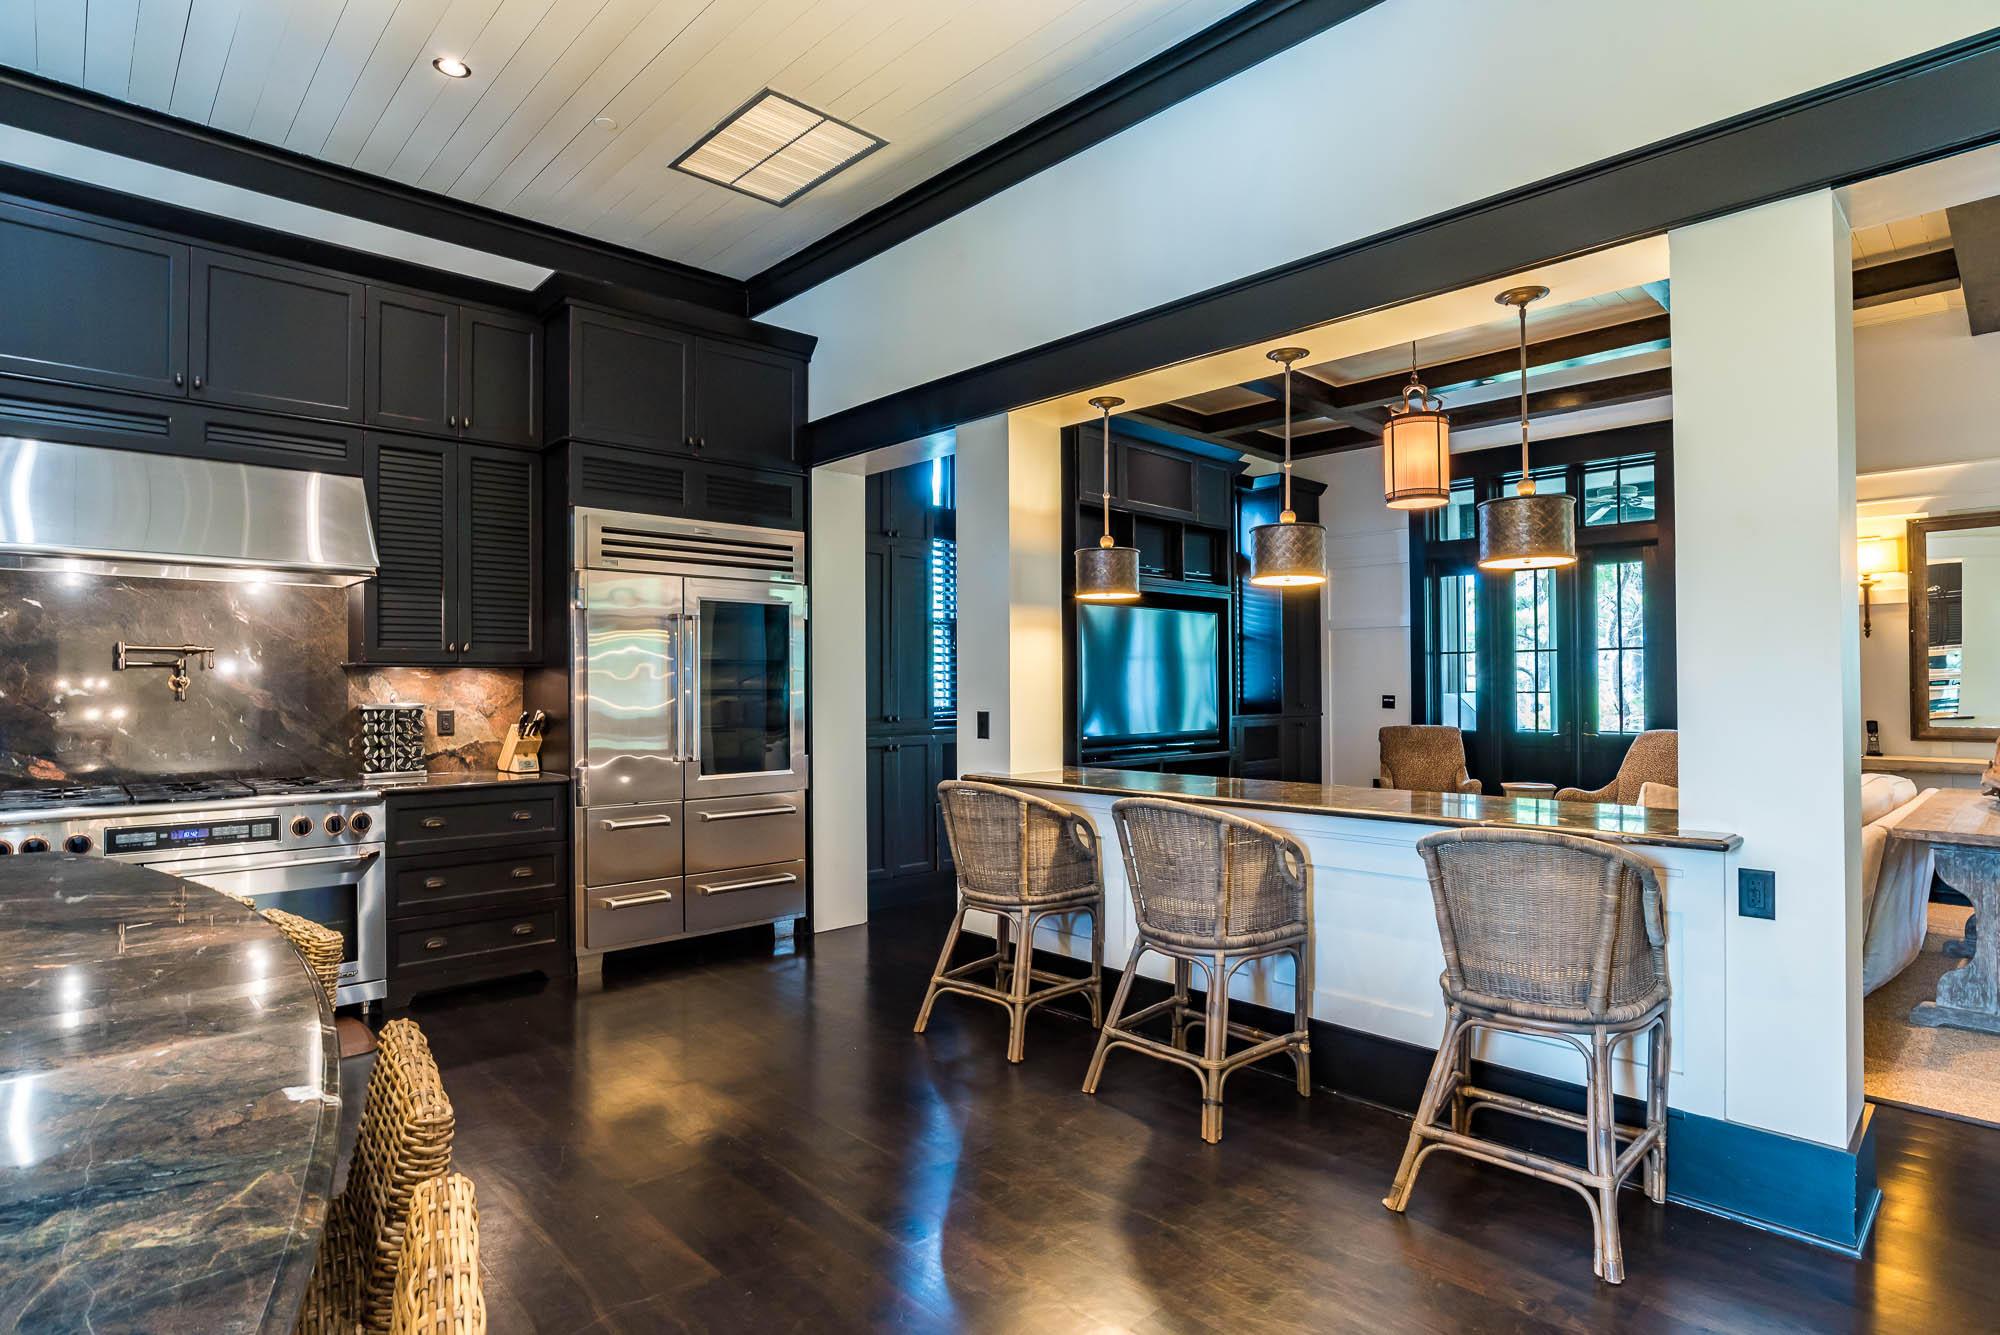 135 Blackwater,Santa Rosa Beach,Florida 32459,6 Bedrooms Bedrooms,6 BathroomsBathrooms,Detached single family,Blackwater,20131126143817002353000000